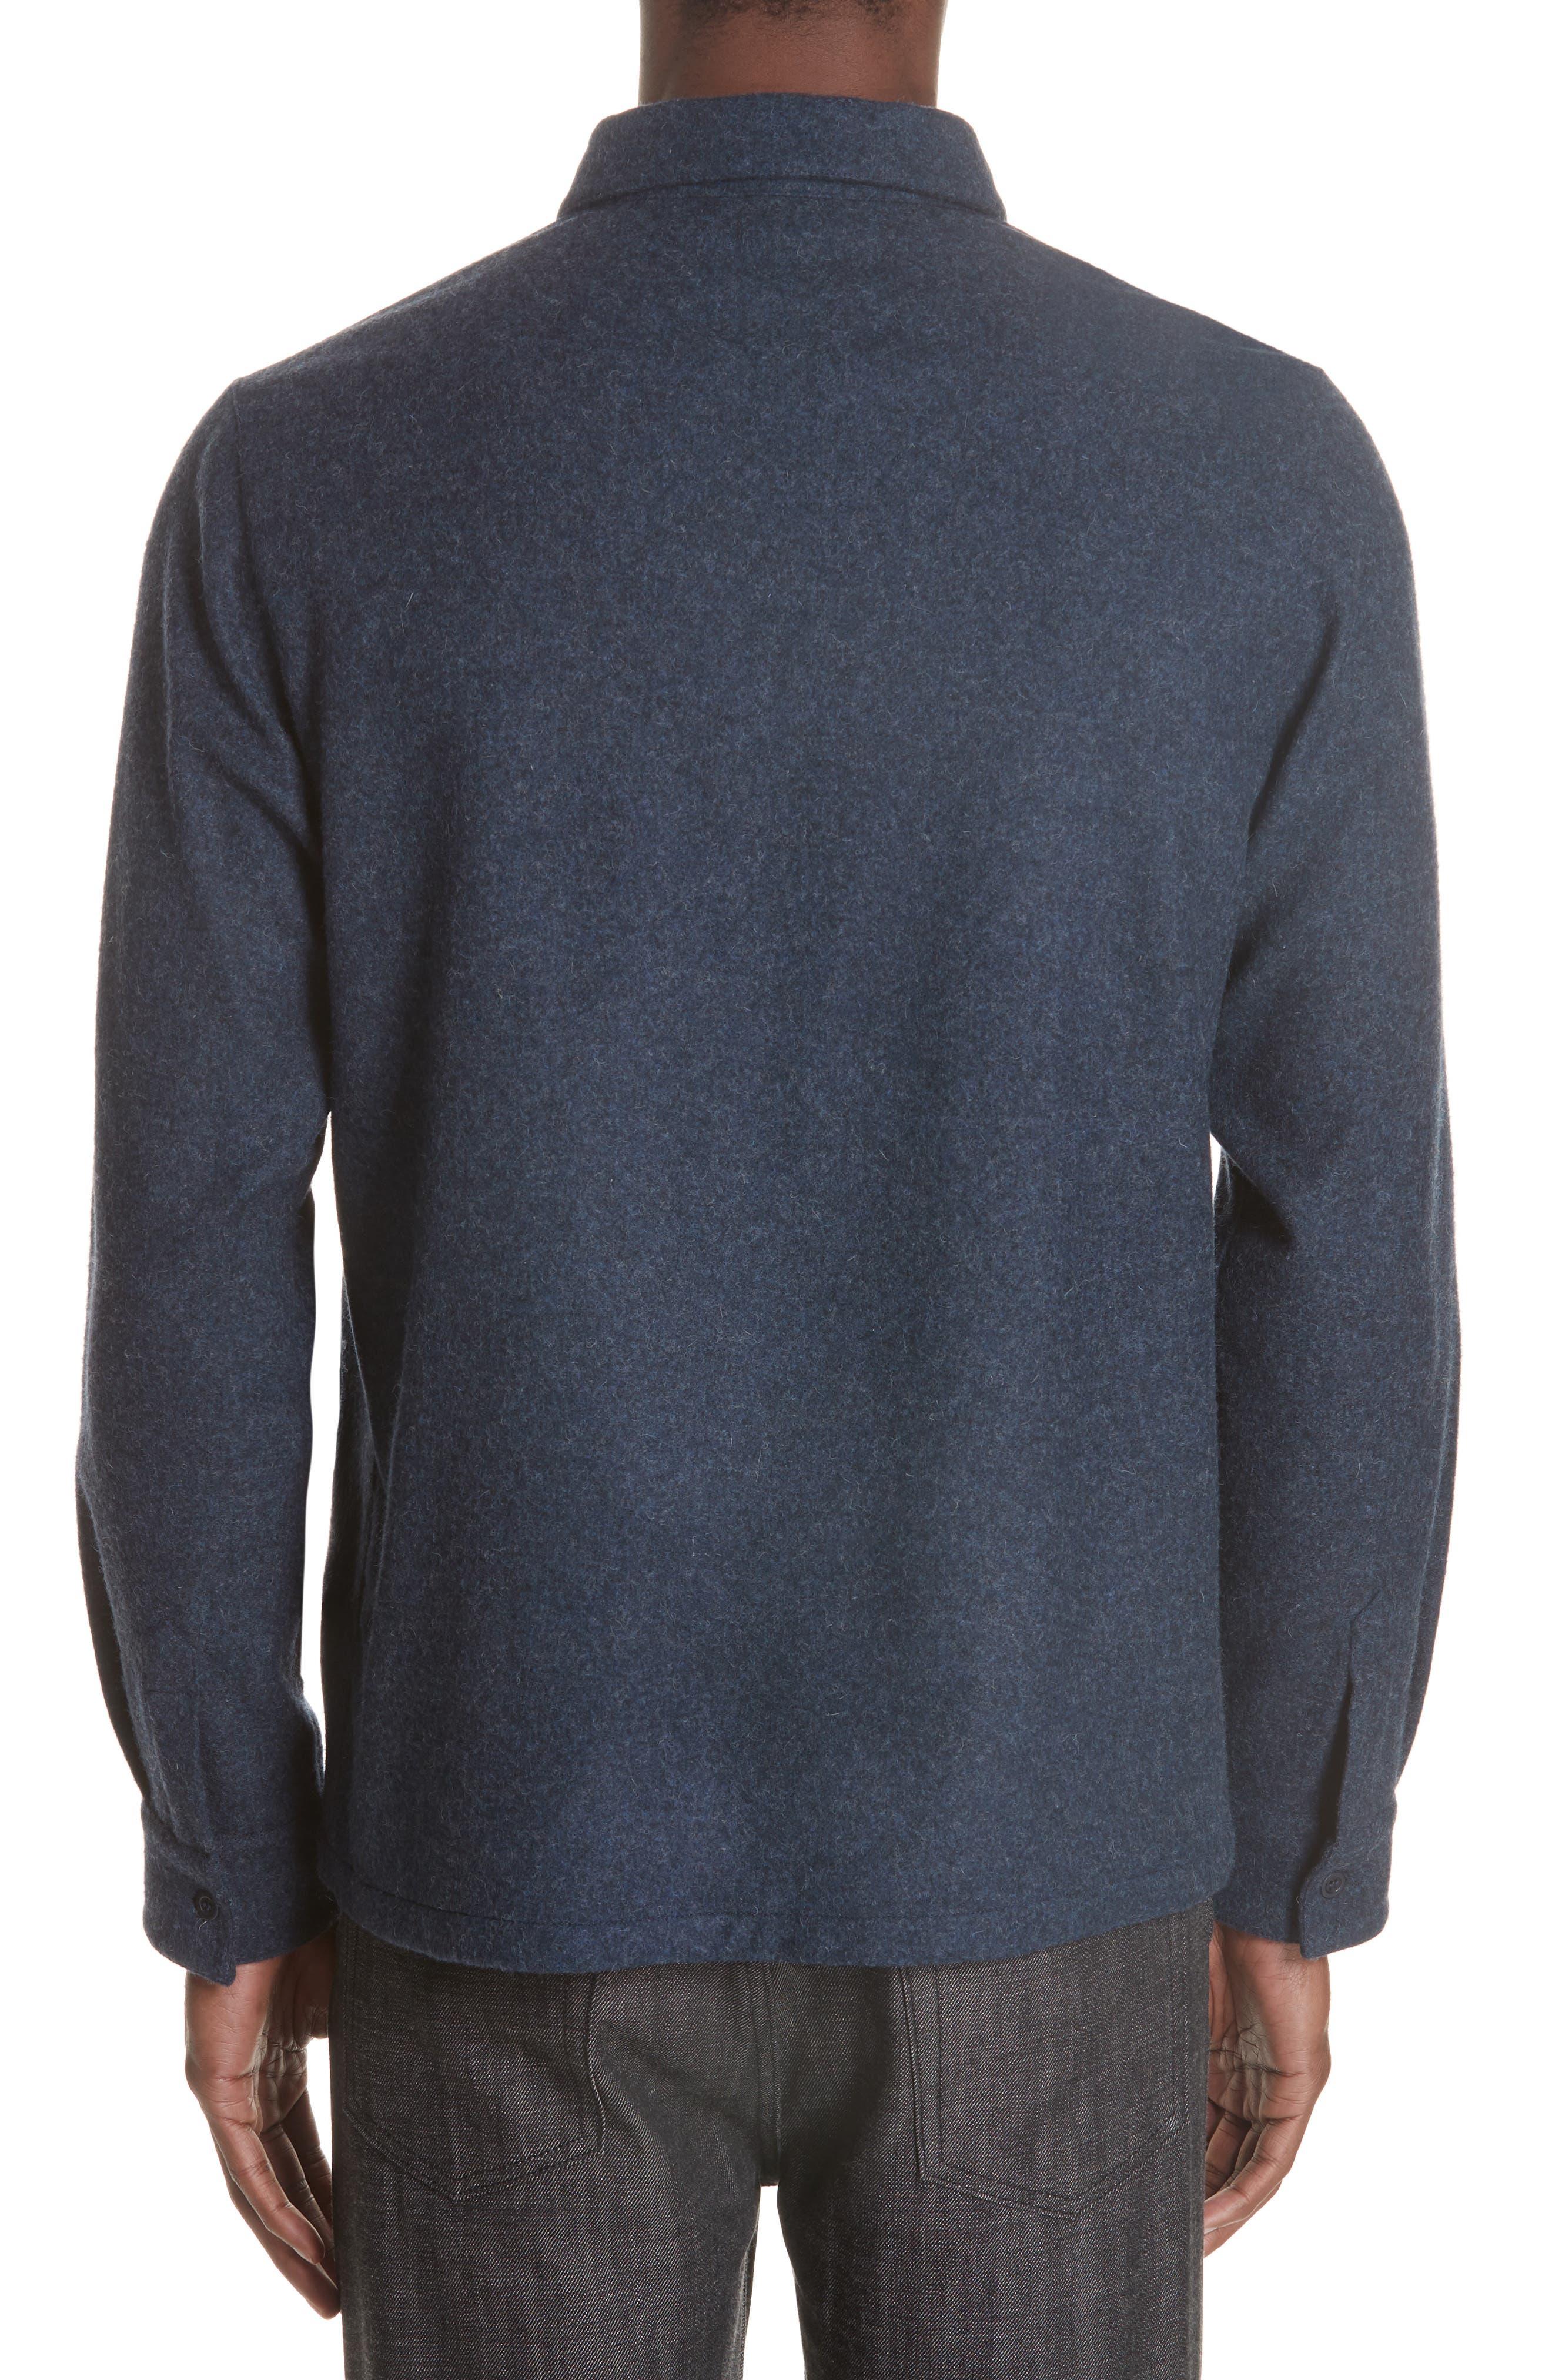 Surchemise Joe Wool Shirt,                             Alternate thumbnail 3, color,                             MARINE CHINE PIA